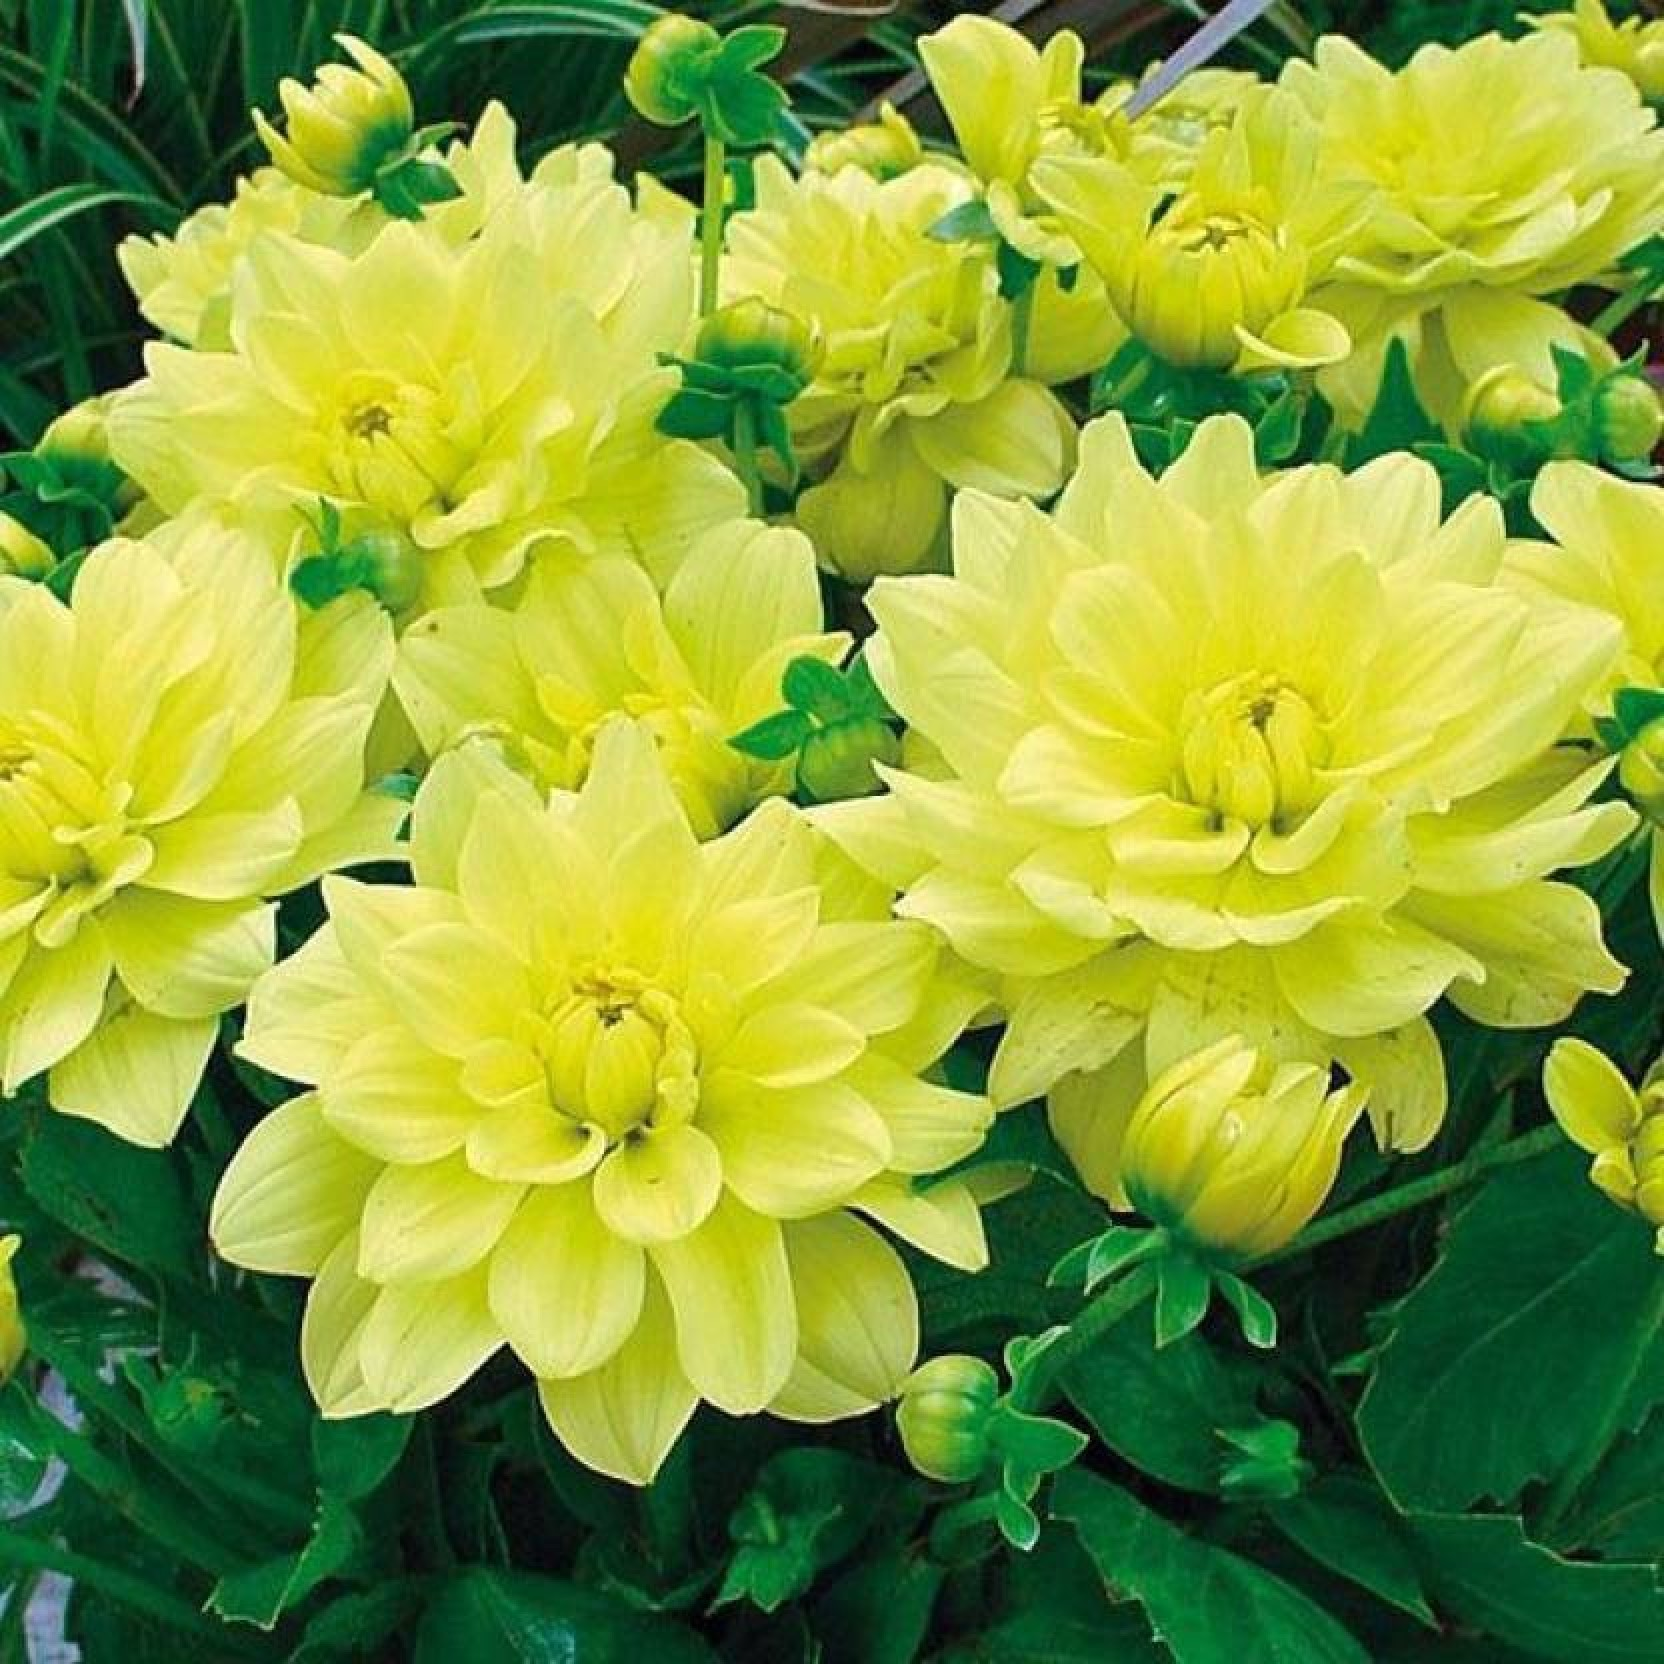 Priyathams Rare Exotic Beautiful Yellow Dahlia Seed Price In India